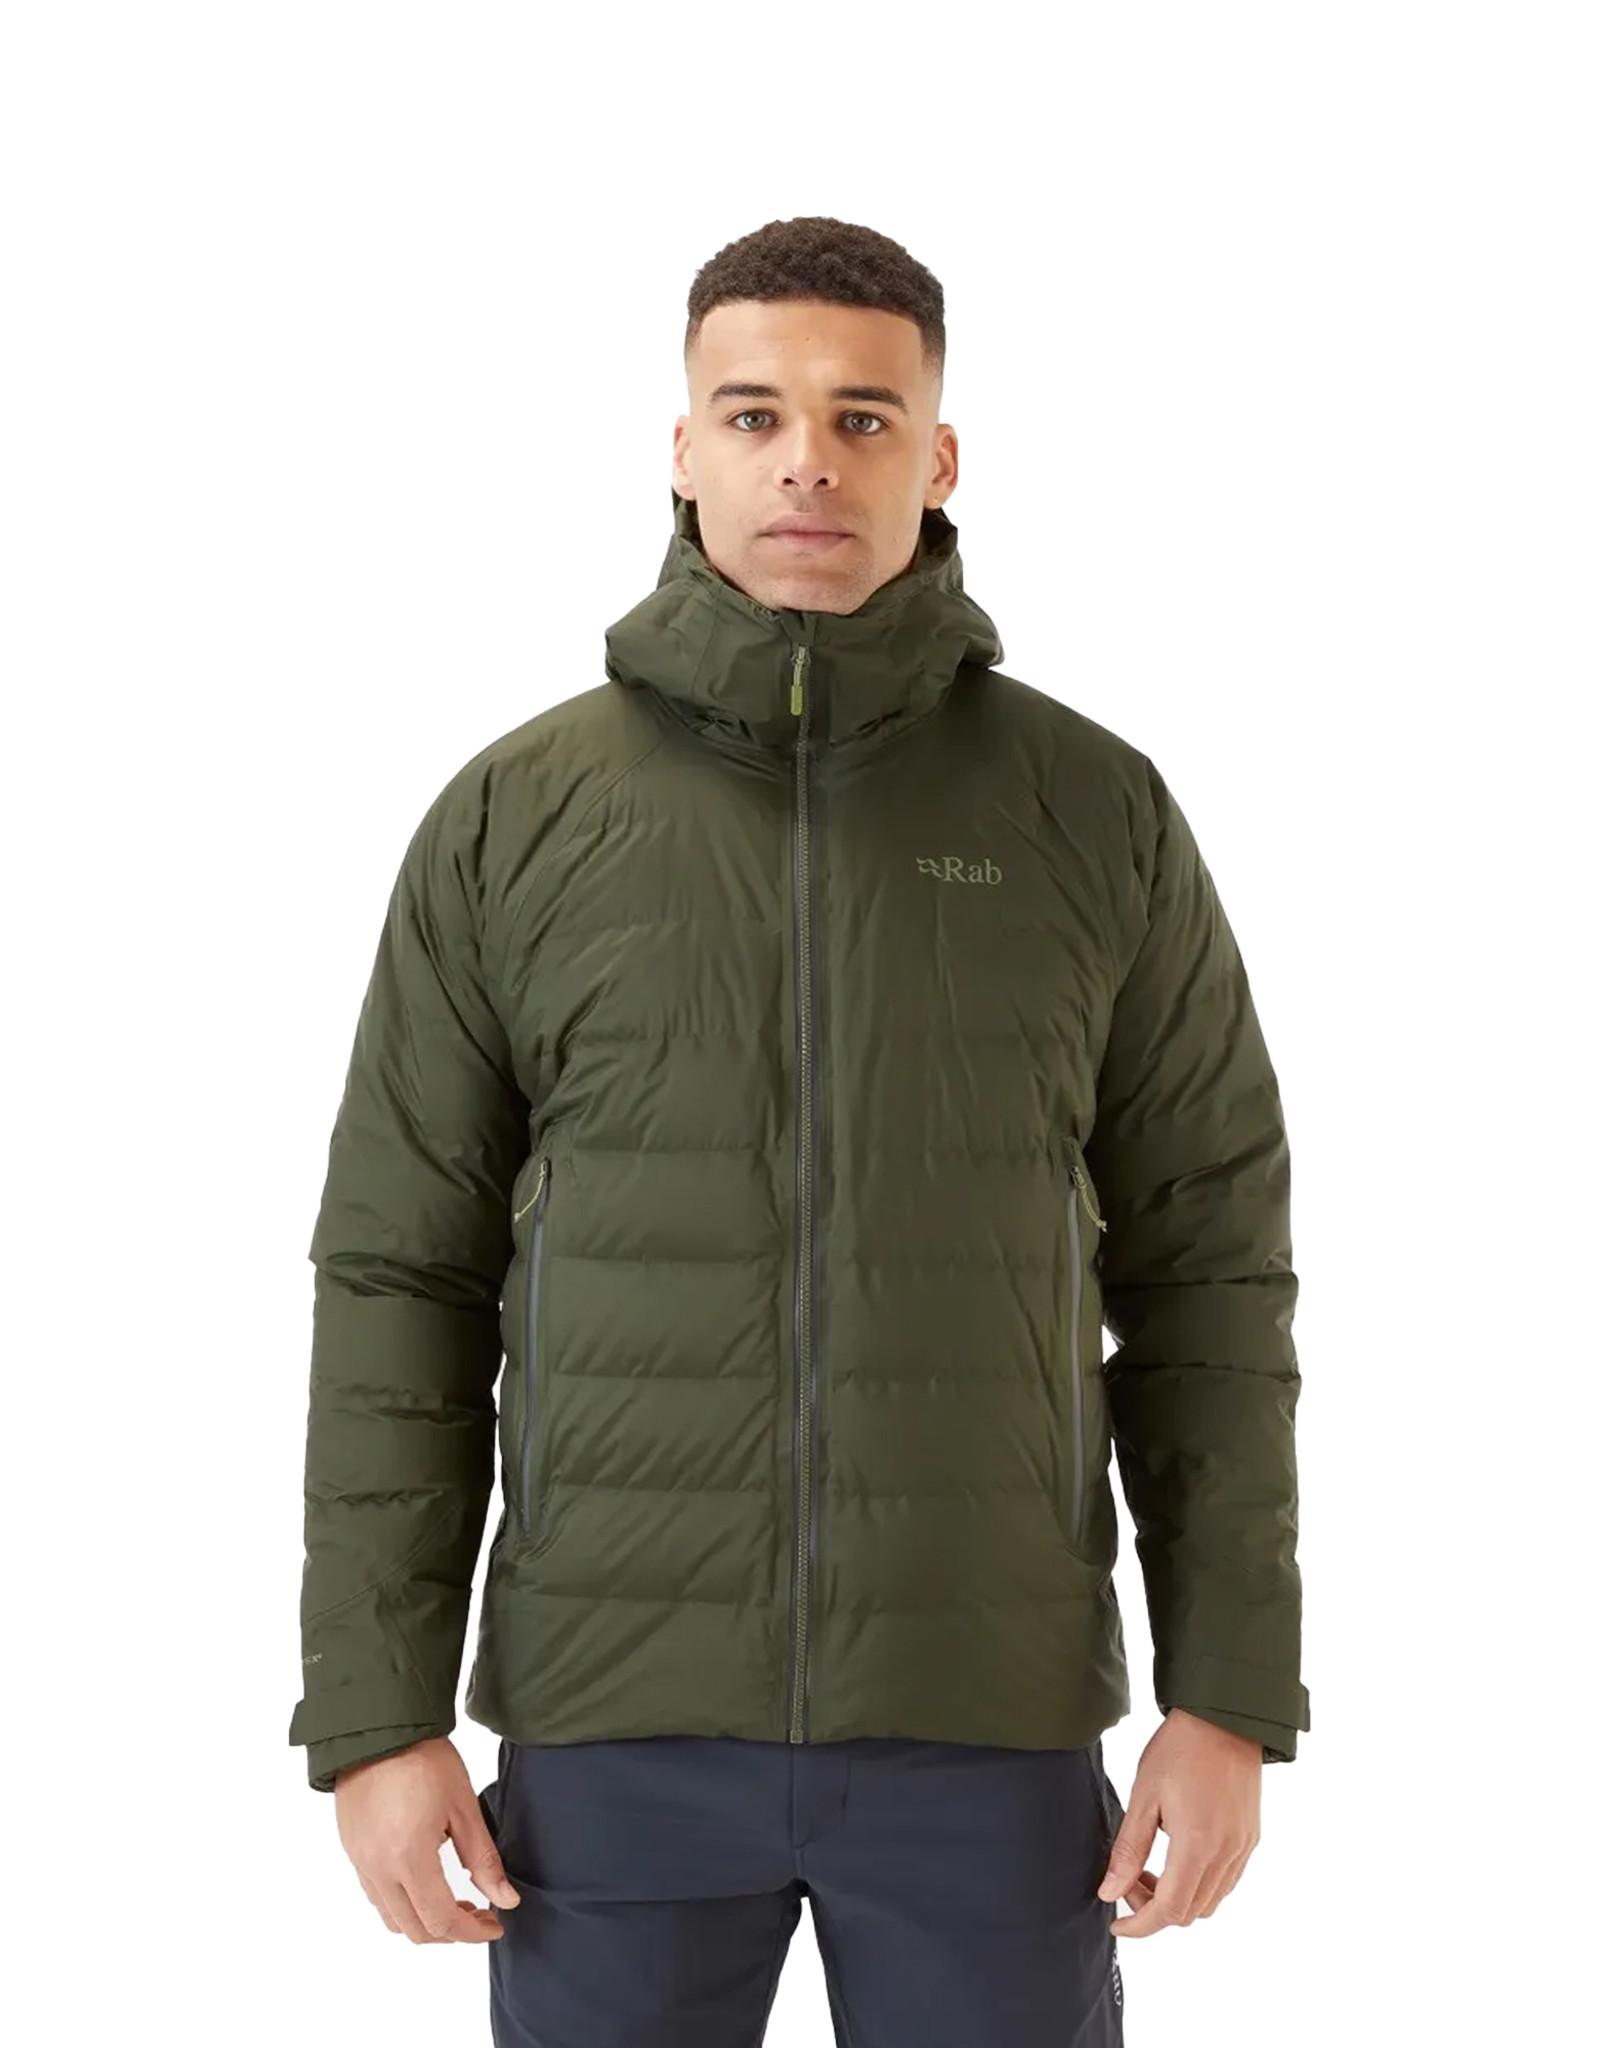 rab Rab Valiance Jacket